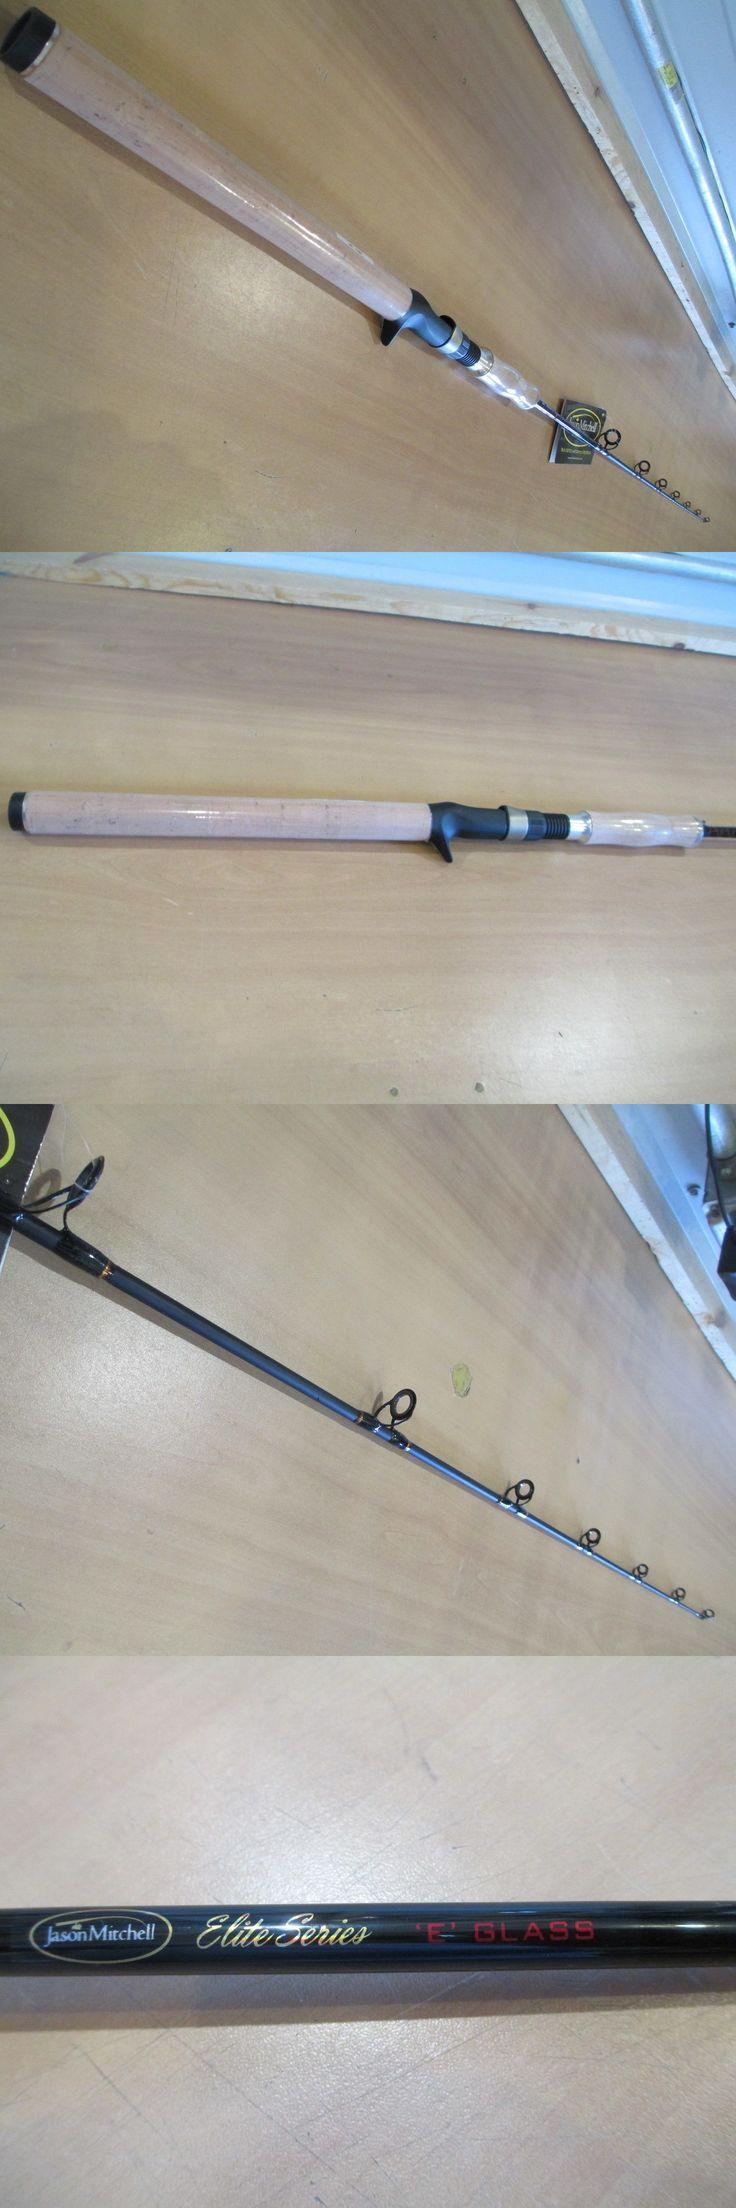 Trolling Rods 56732: Jason Mitchell Elite Series 5 Foot Medium Heavy Trolling Fishing Rod -> BUY IT NOW ONLY: $49.99 on eBay!